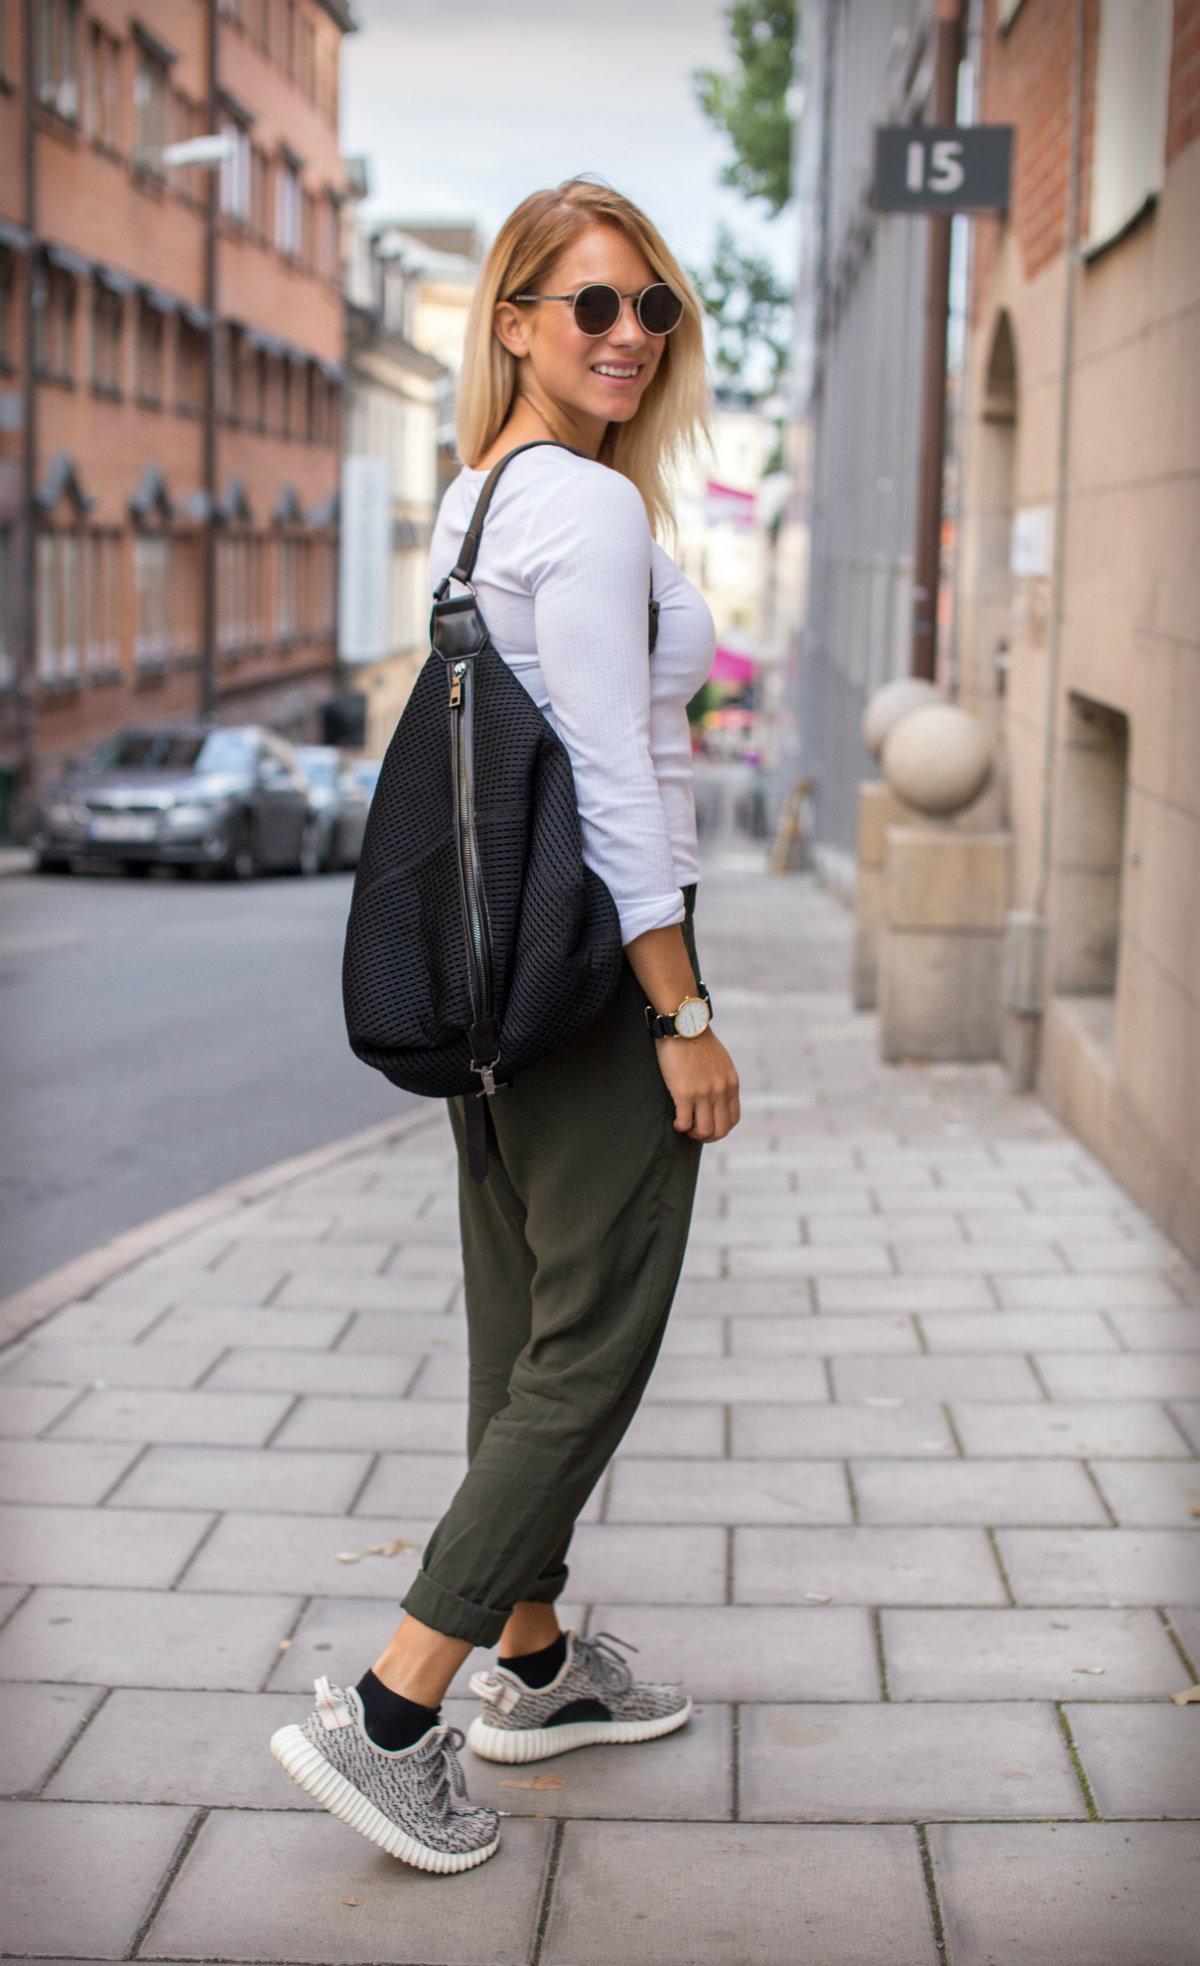 Minifitness_citylook_adidas